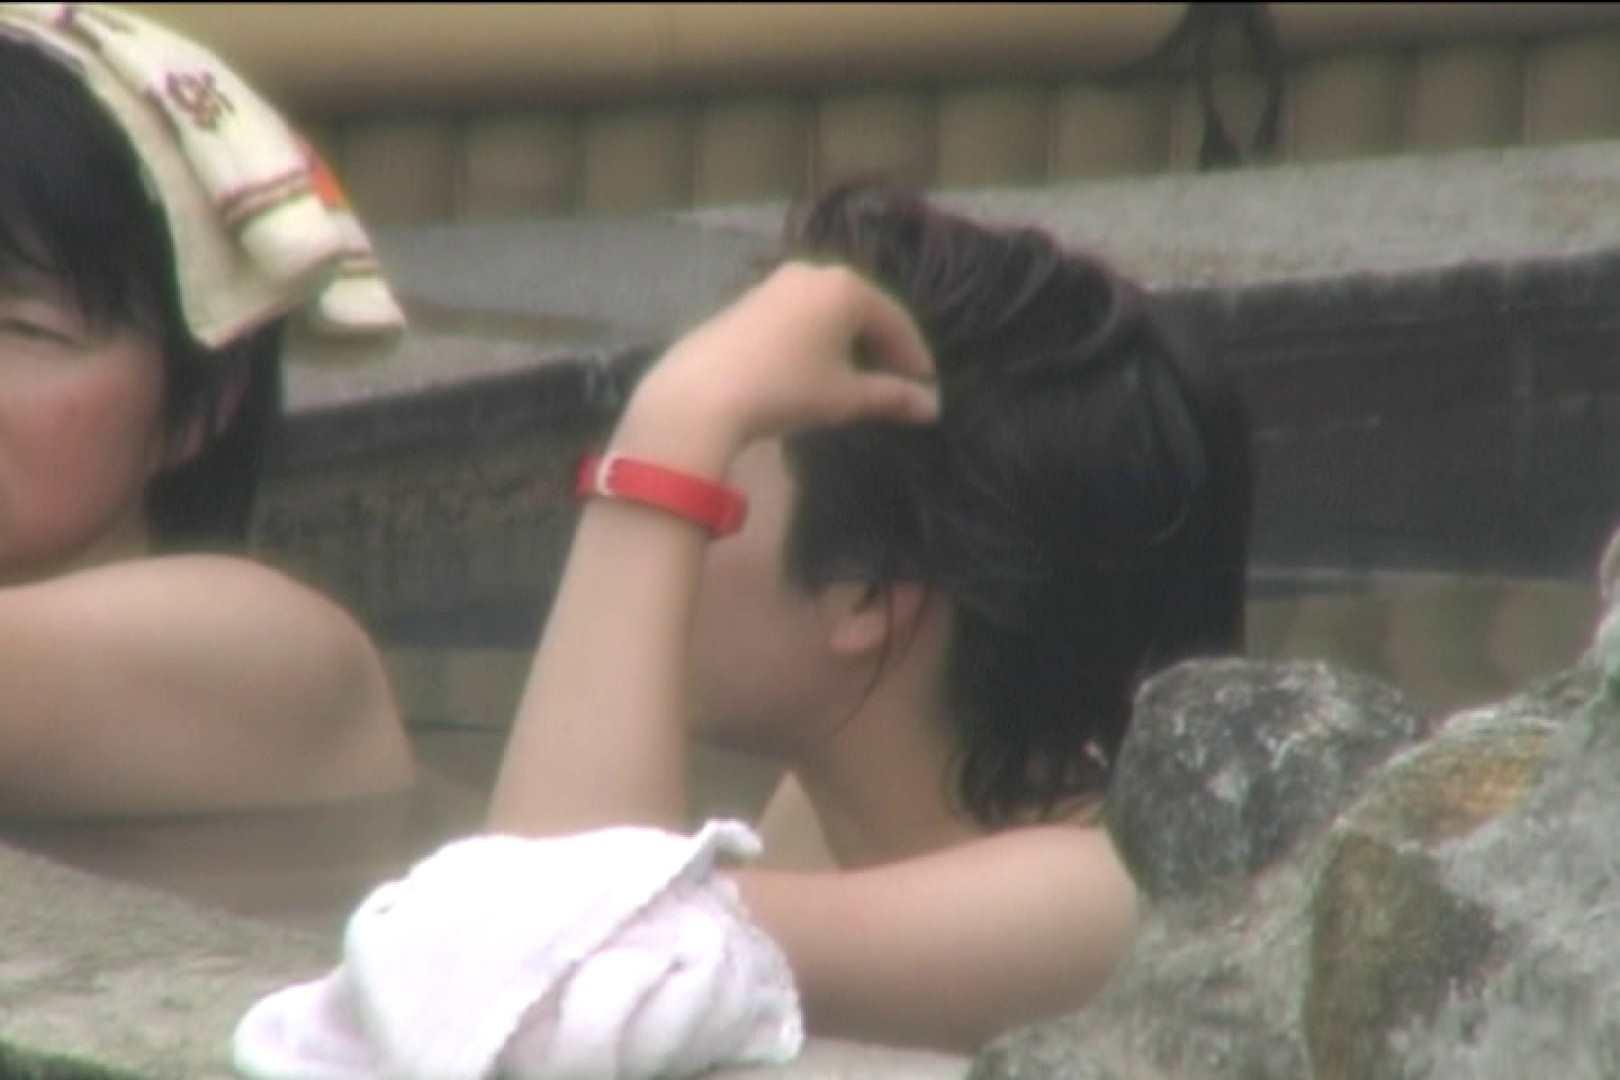 Aquaな露天風呂Vol.122 HなOL   0  107pic 97